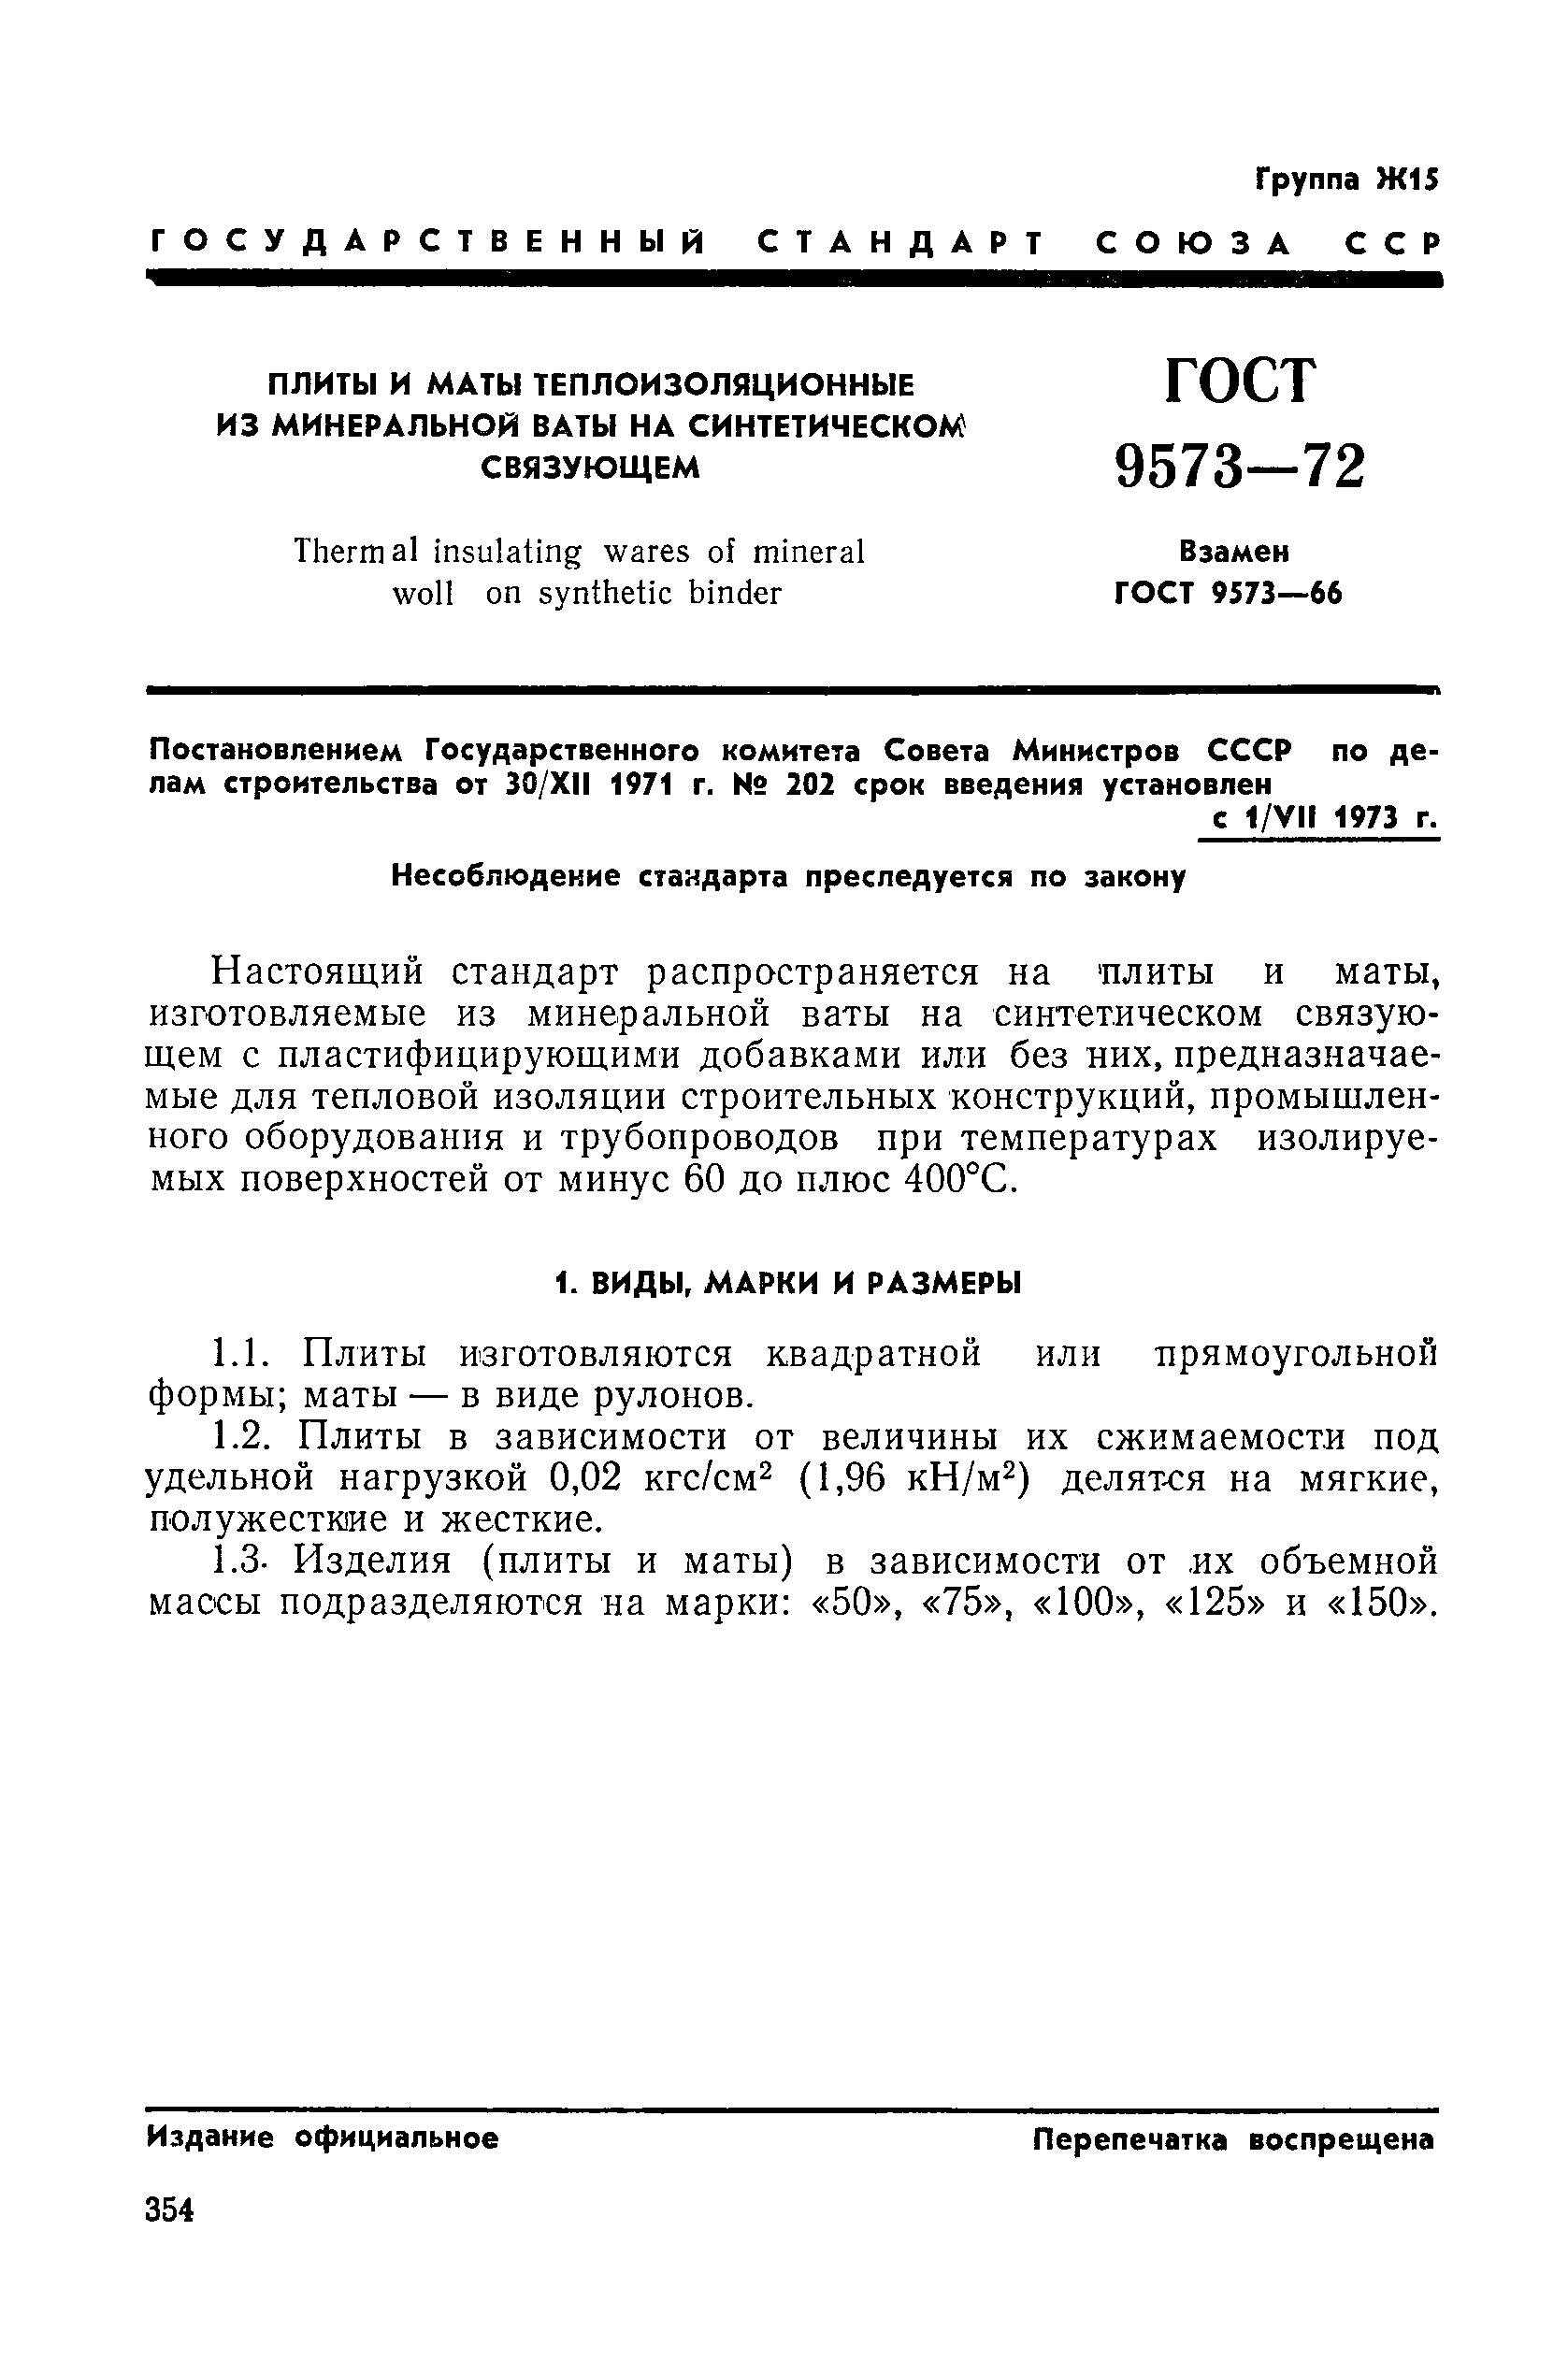 Гост 9573